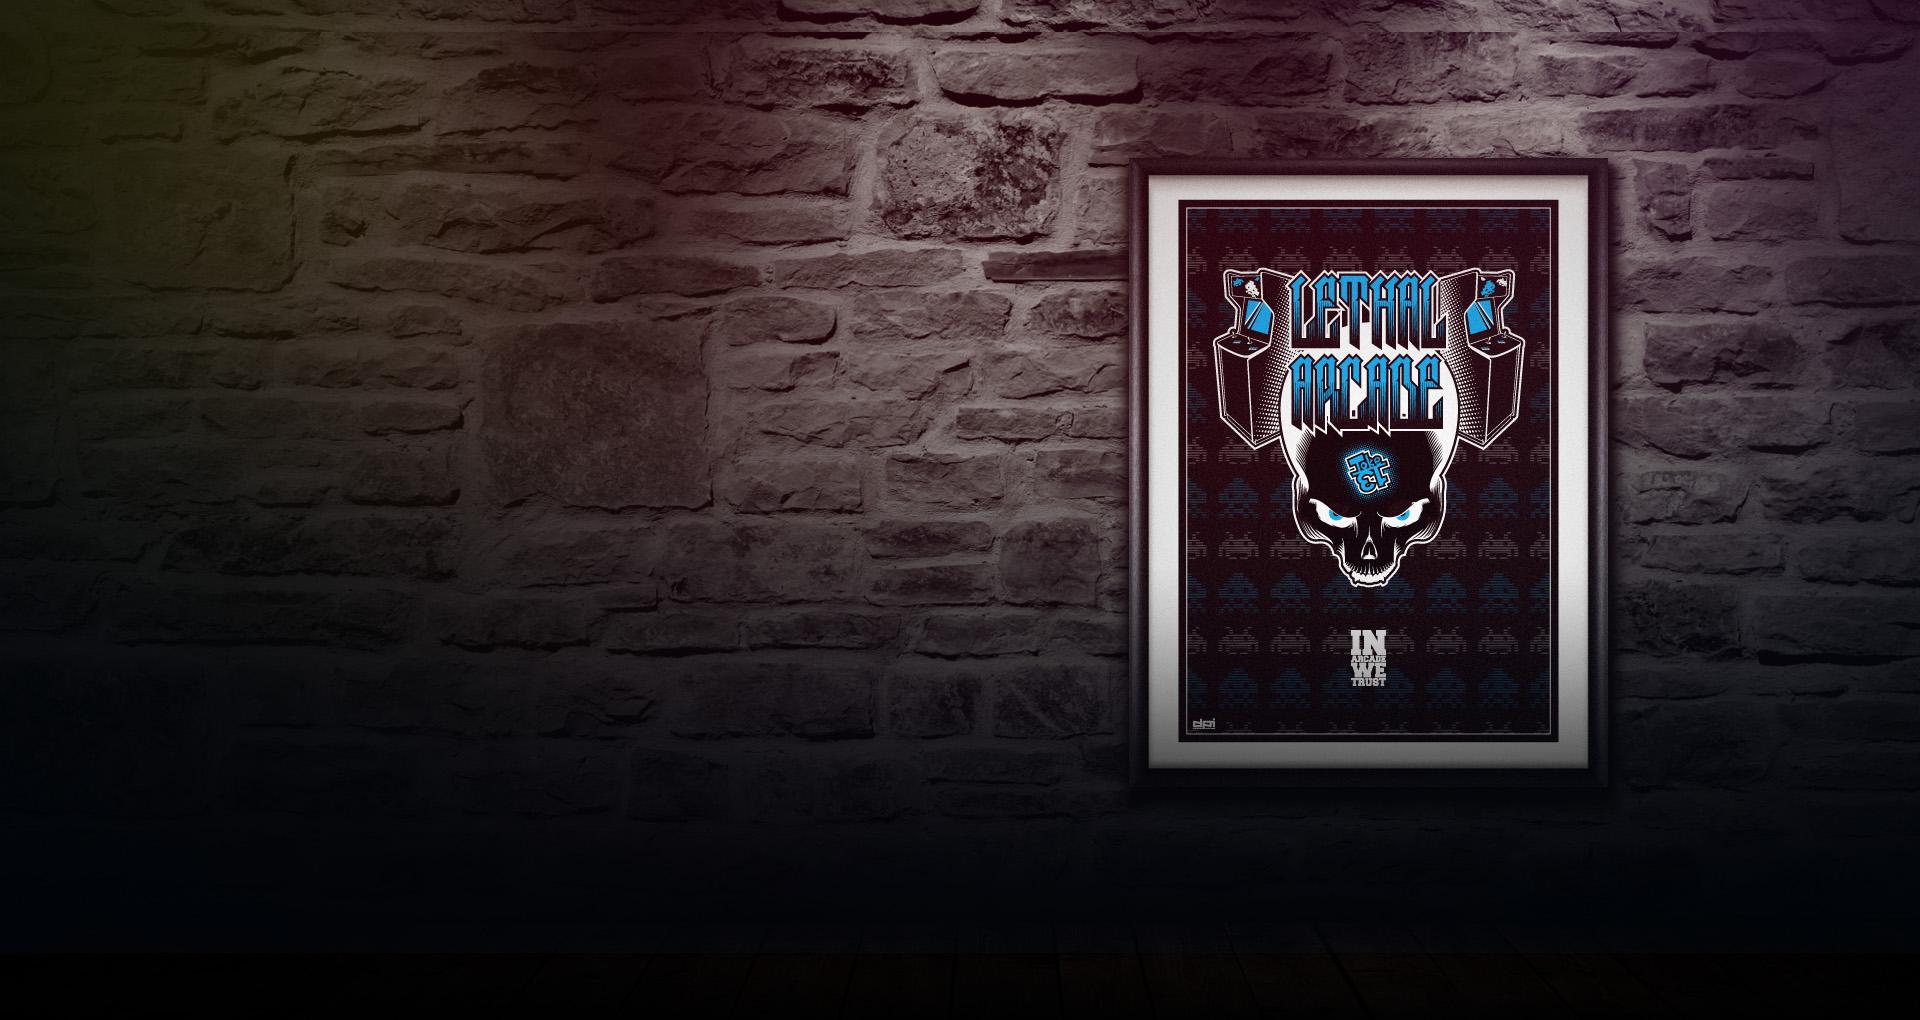 http://drukarniadpi.pl/wp-content/uploads/2013/11/plakaty.jpg